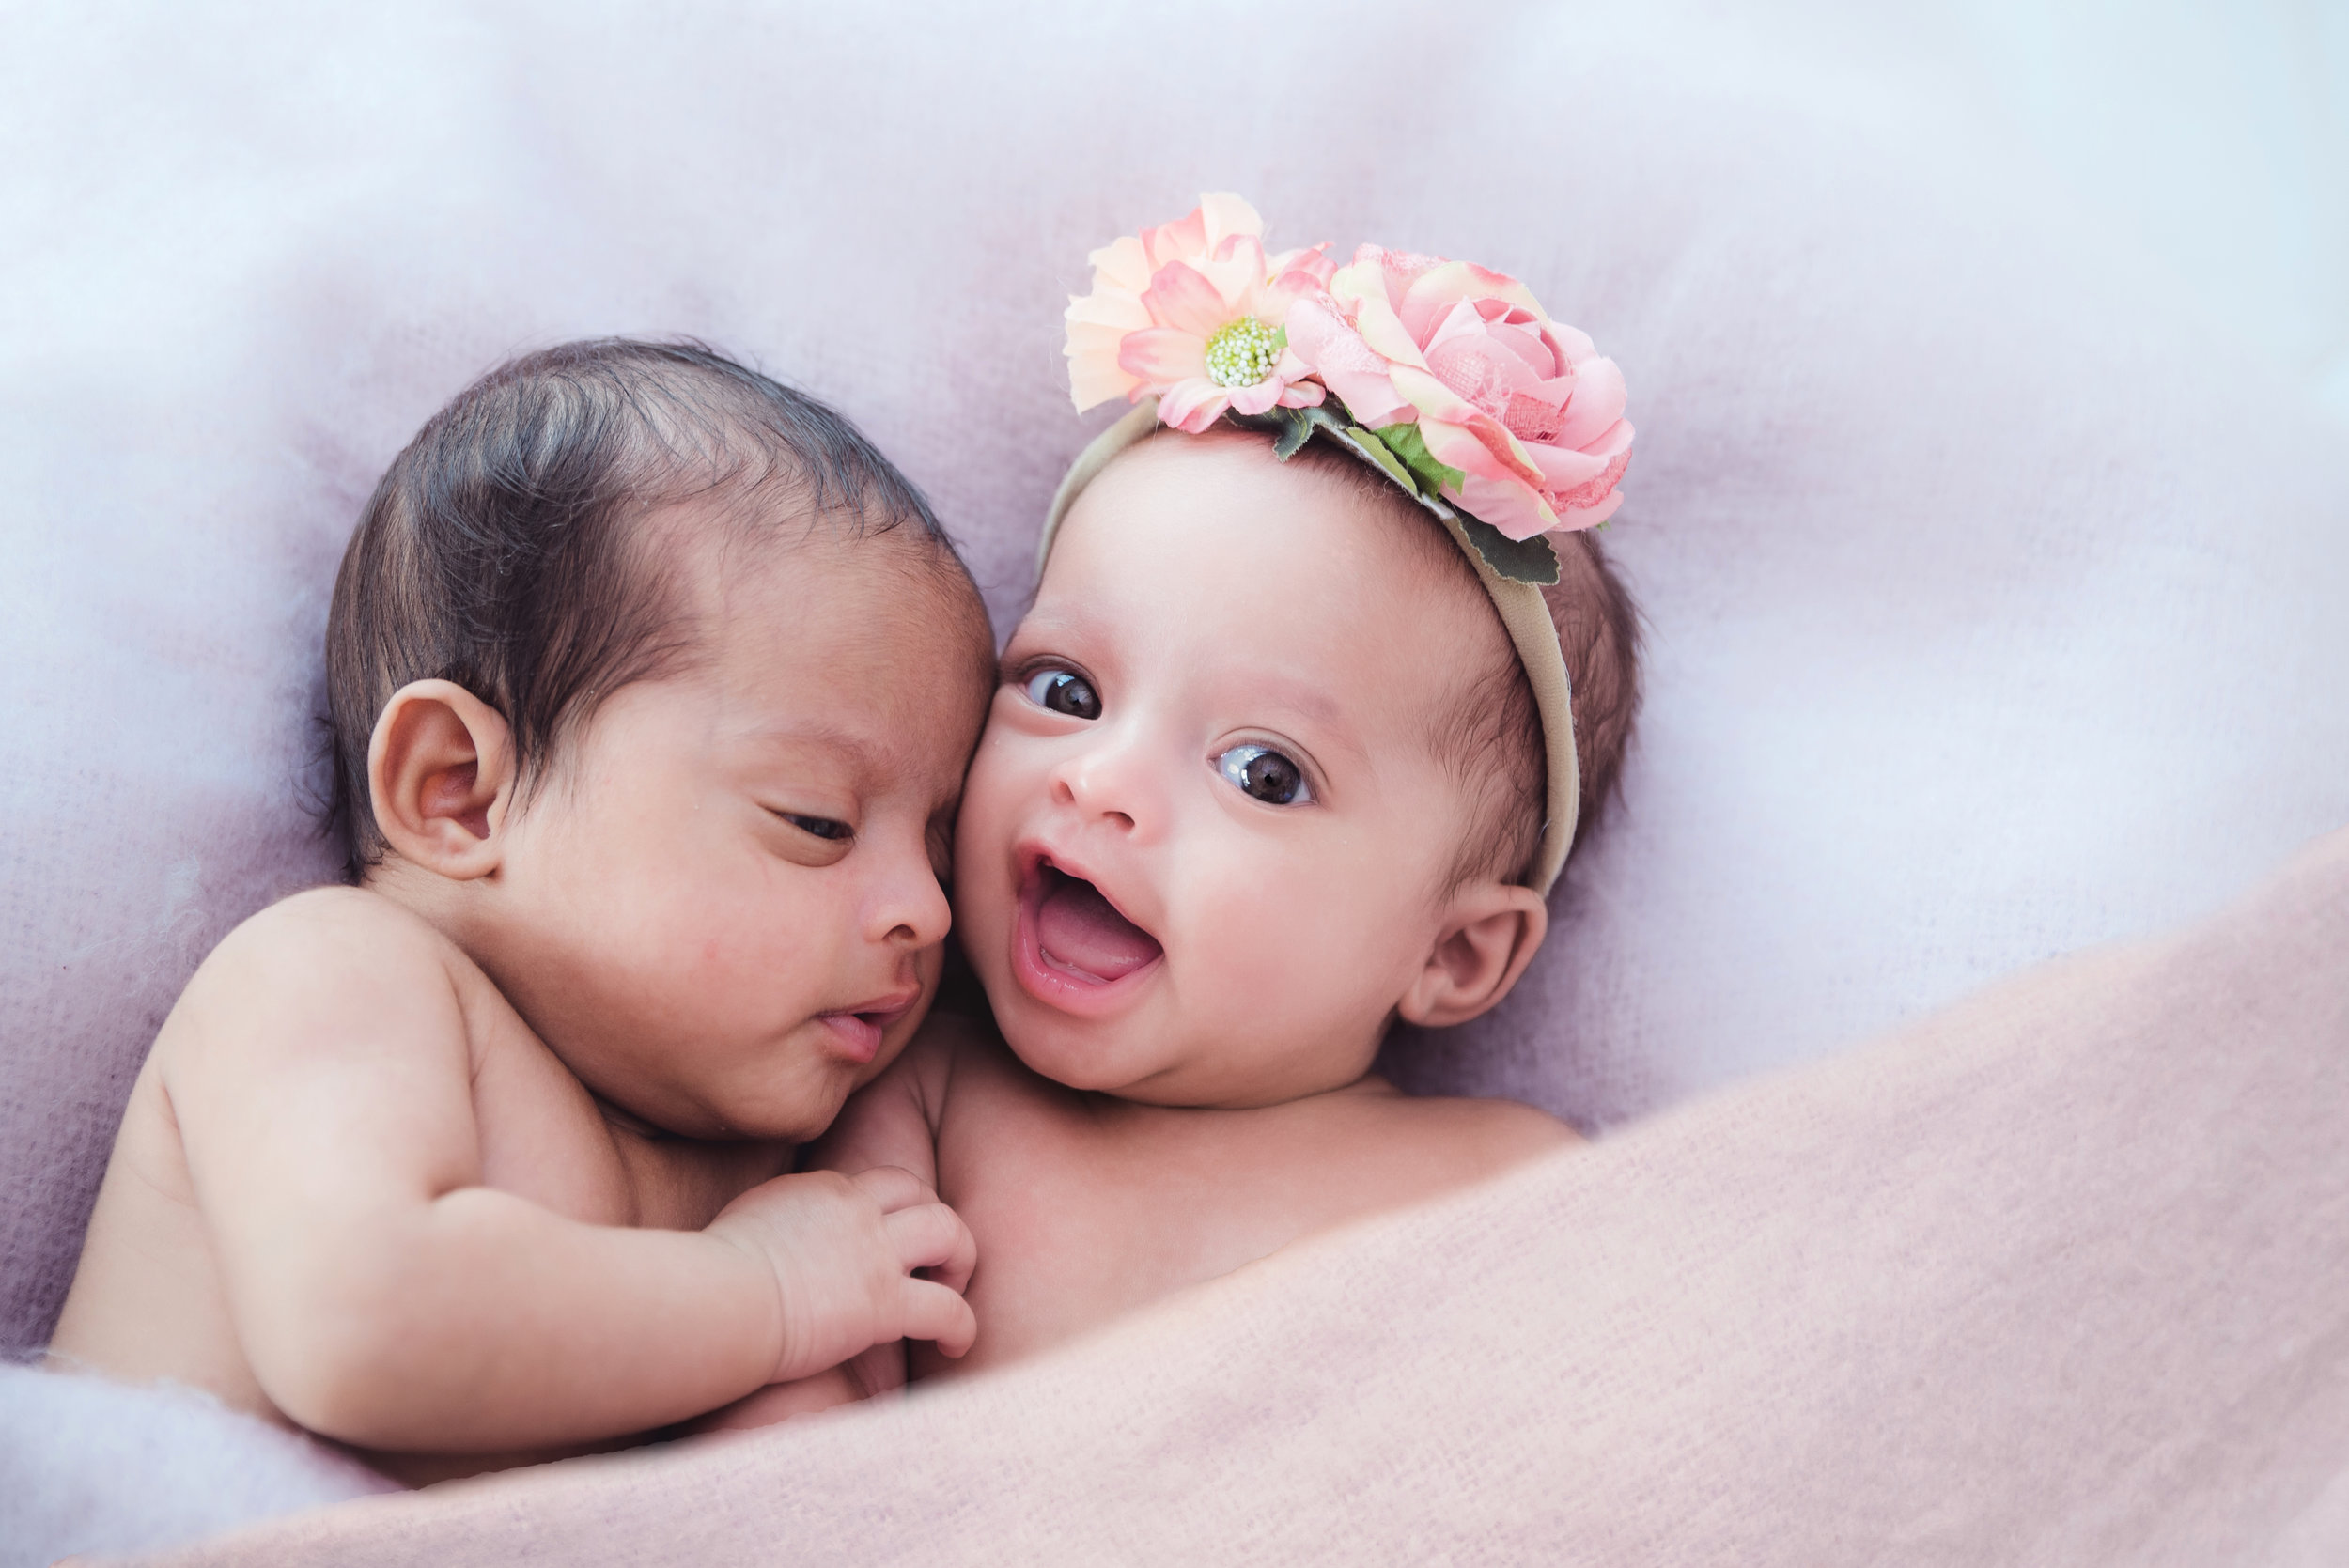 Chini-Sondesh Newborn Photoshoot ❤ NiddledyNoddledy.com ~ Bumps to Babies Photography, Kolkata - 06.jpg